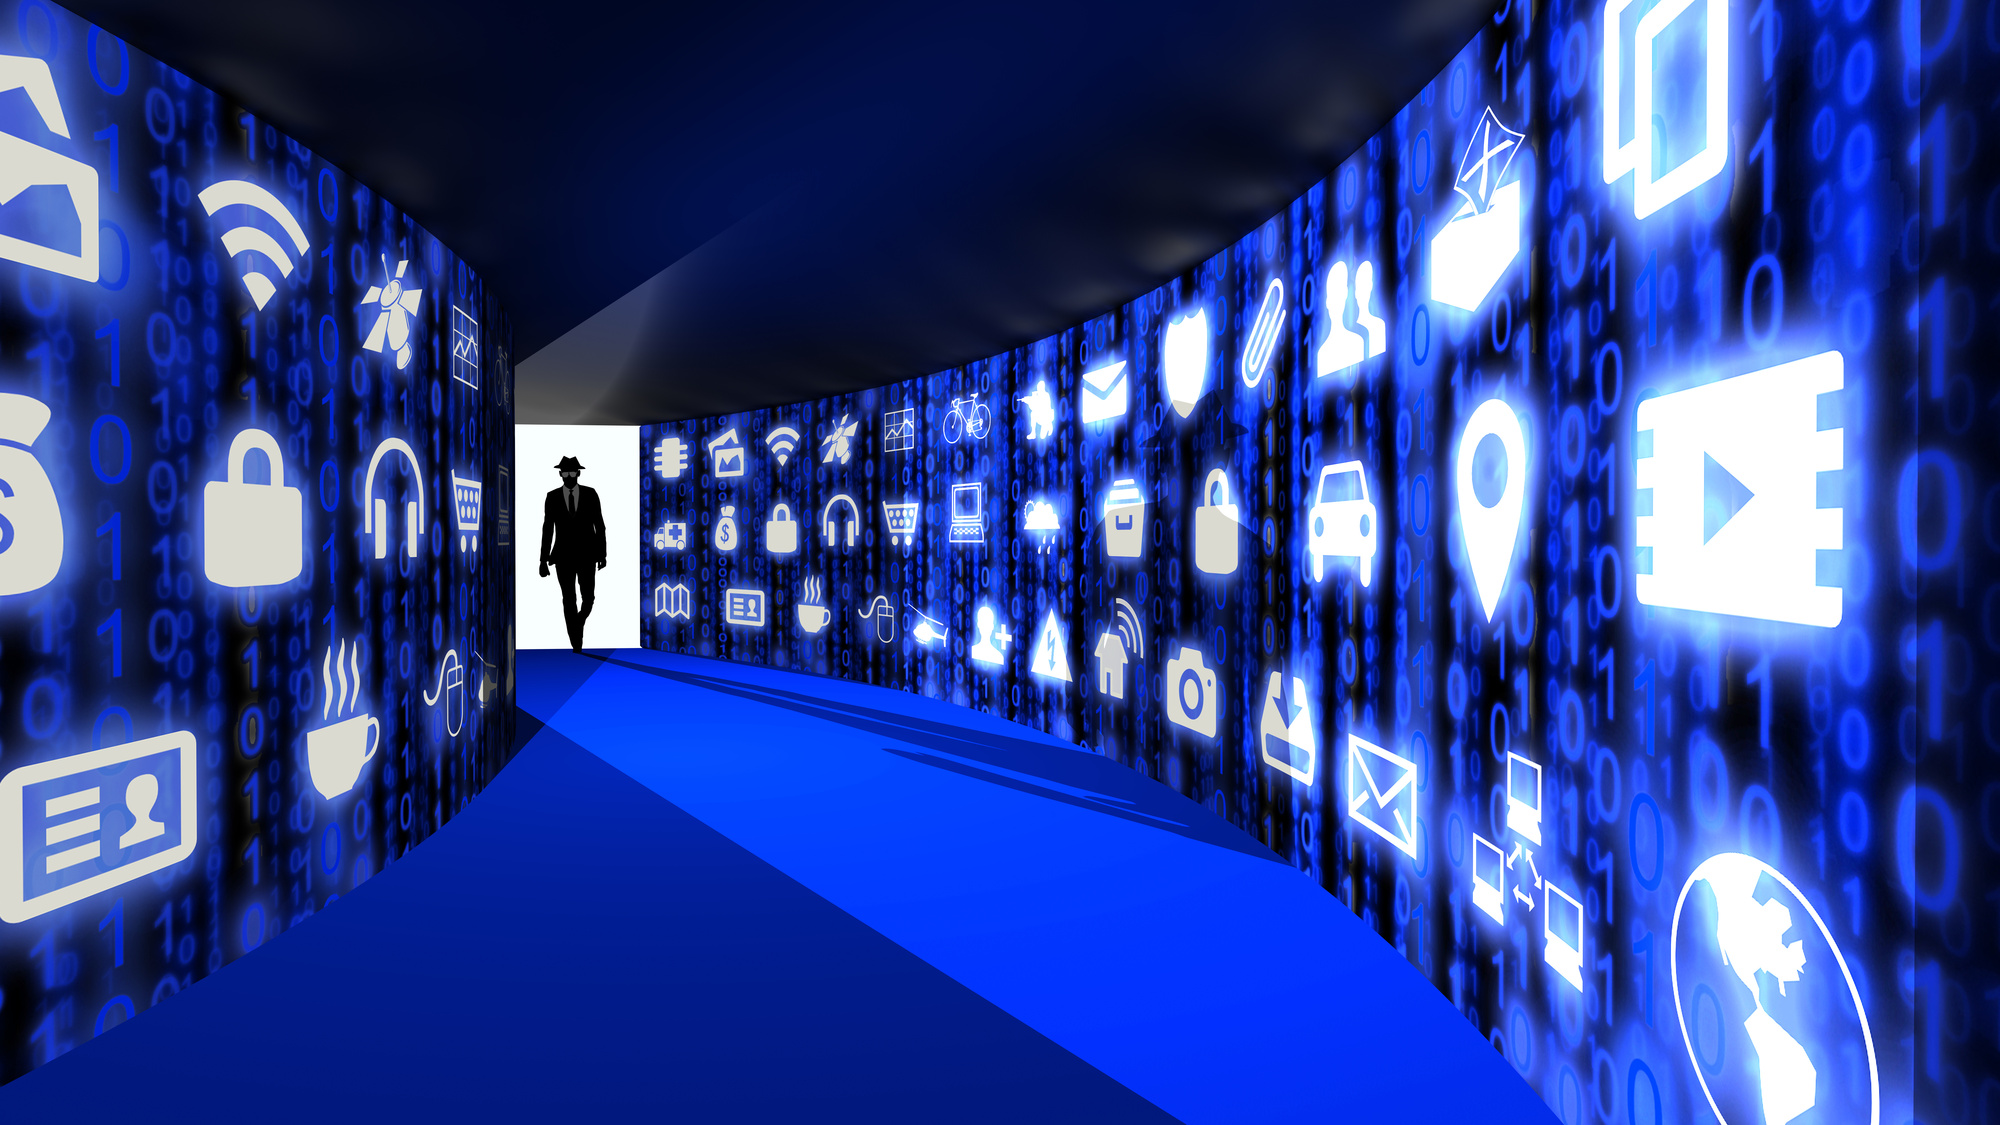 5 Cybersecurity Threats You Need to Keep an Eye on in 2018